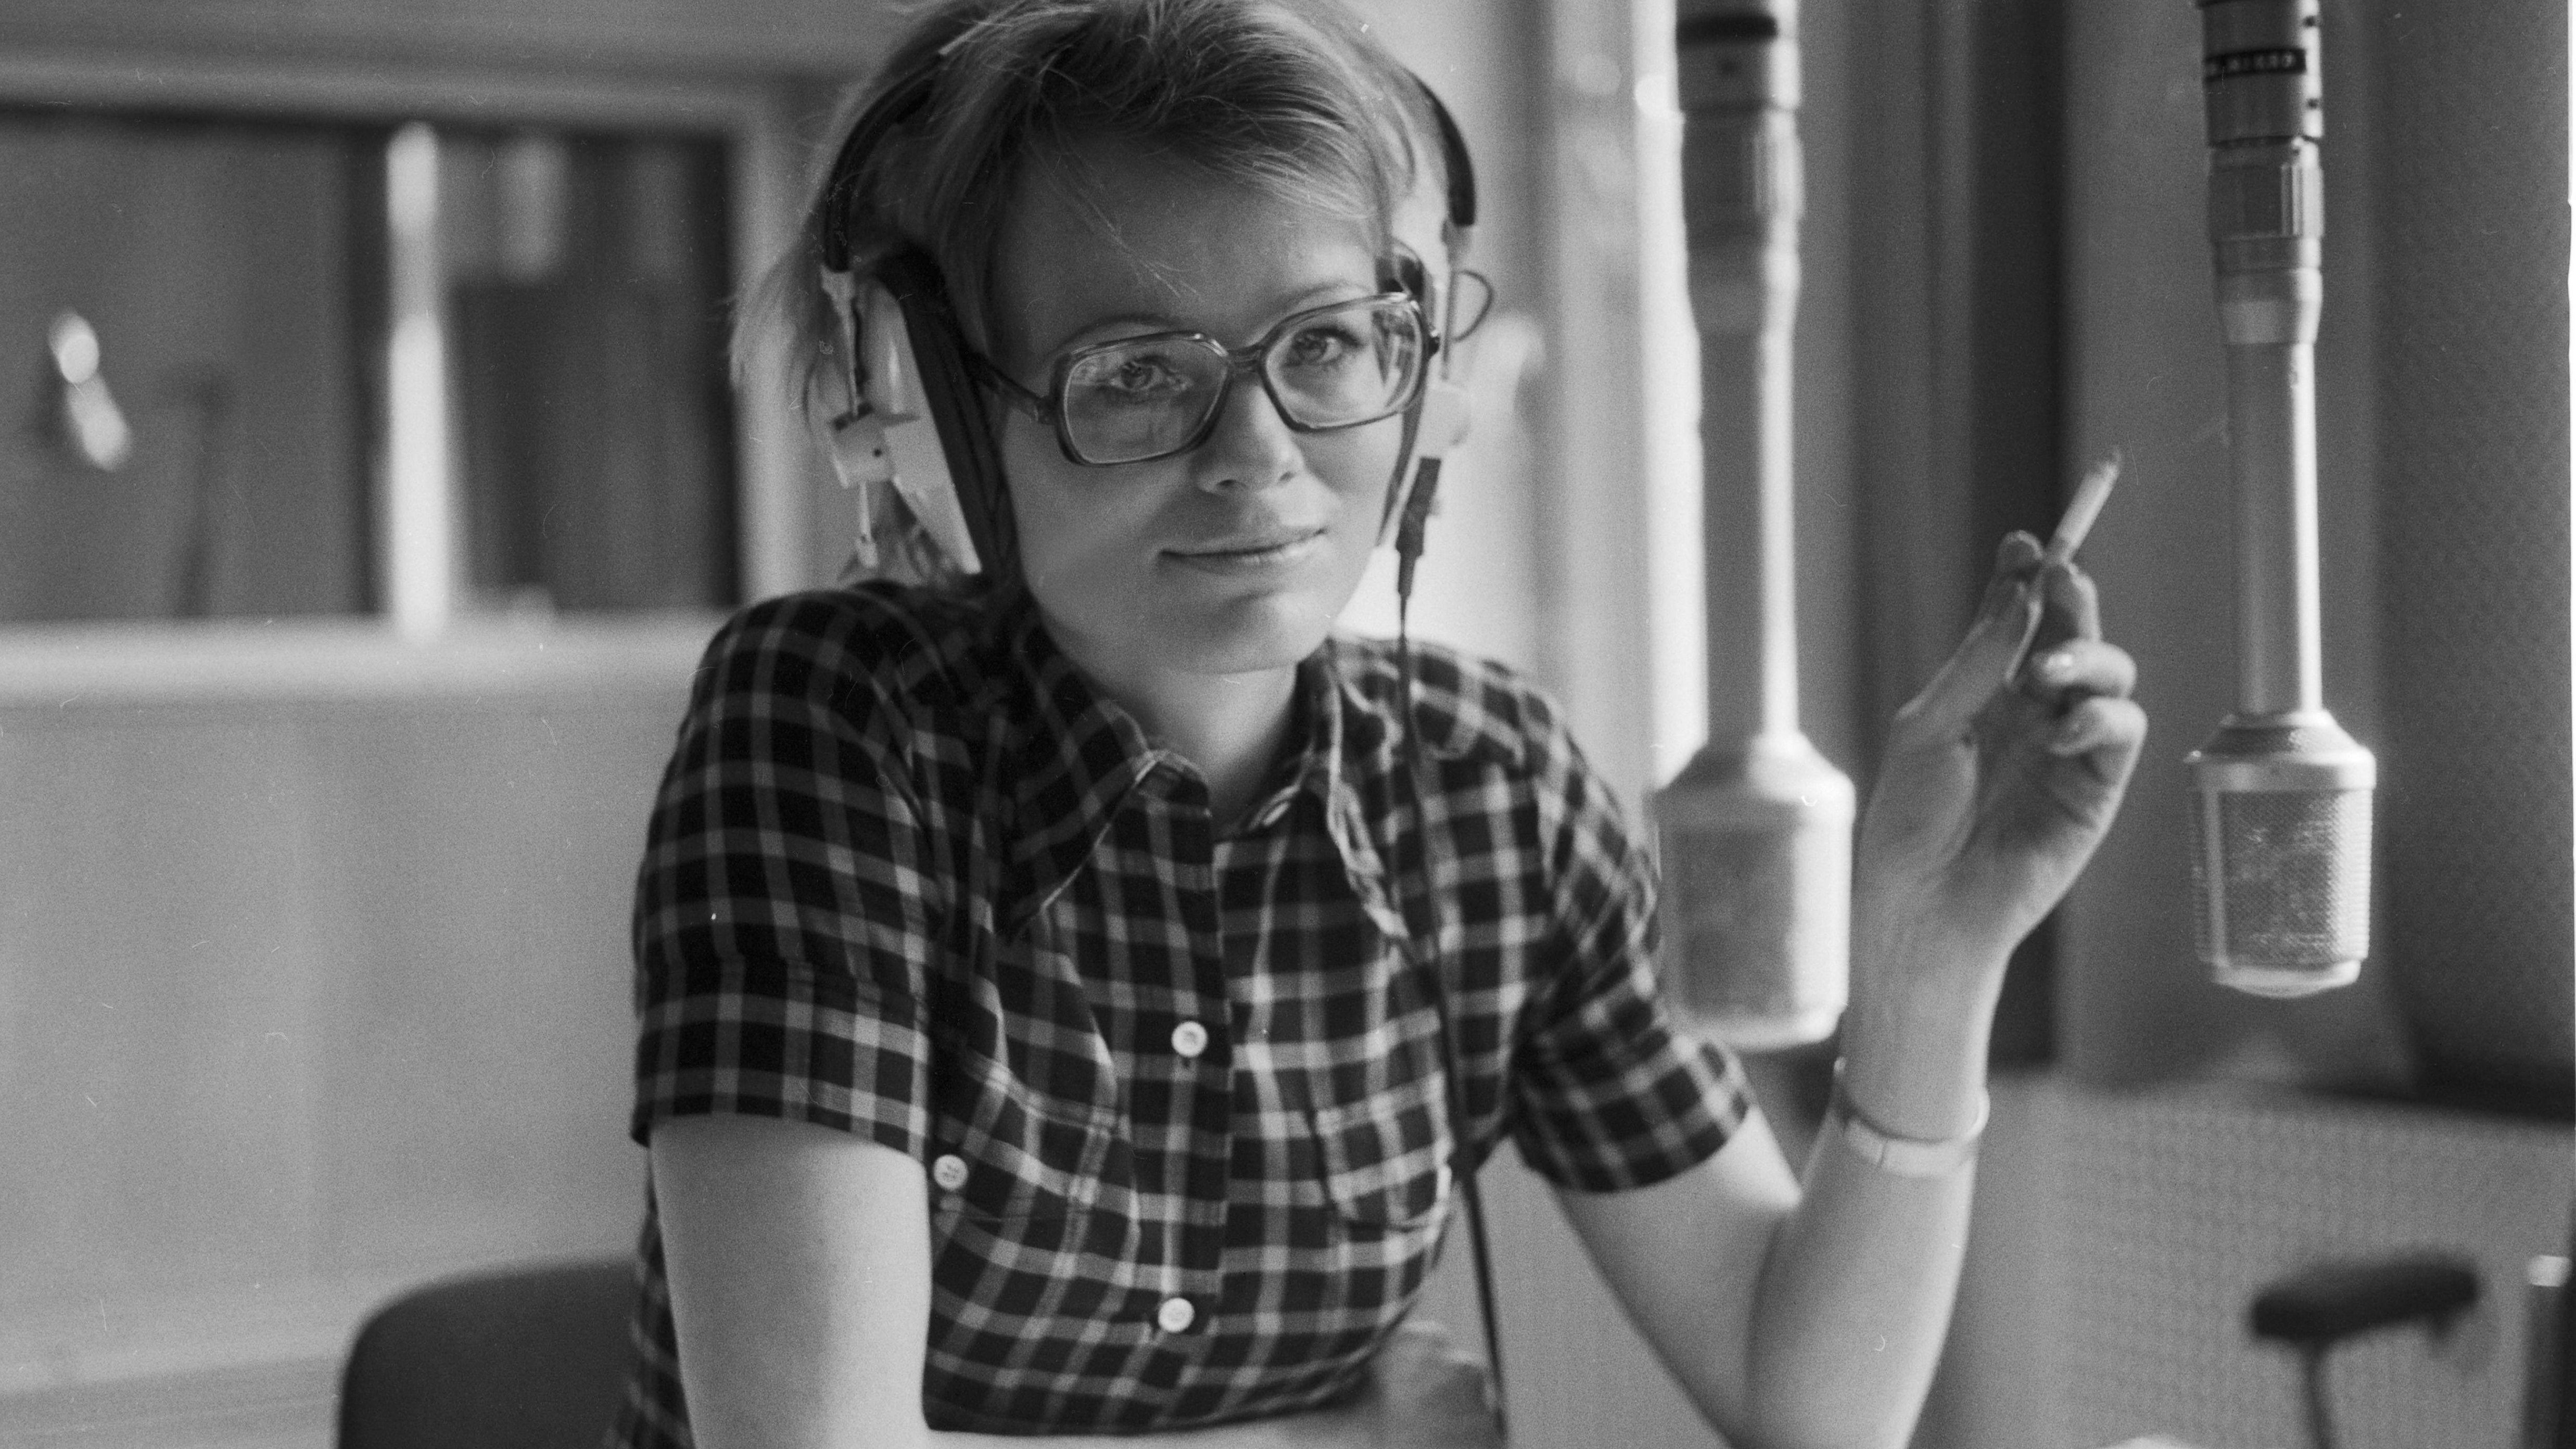 Wibke Bruhns Ende der 1960er in einem Hörfunkstudio